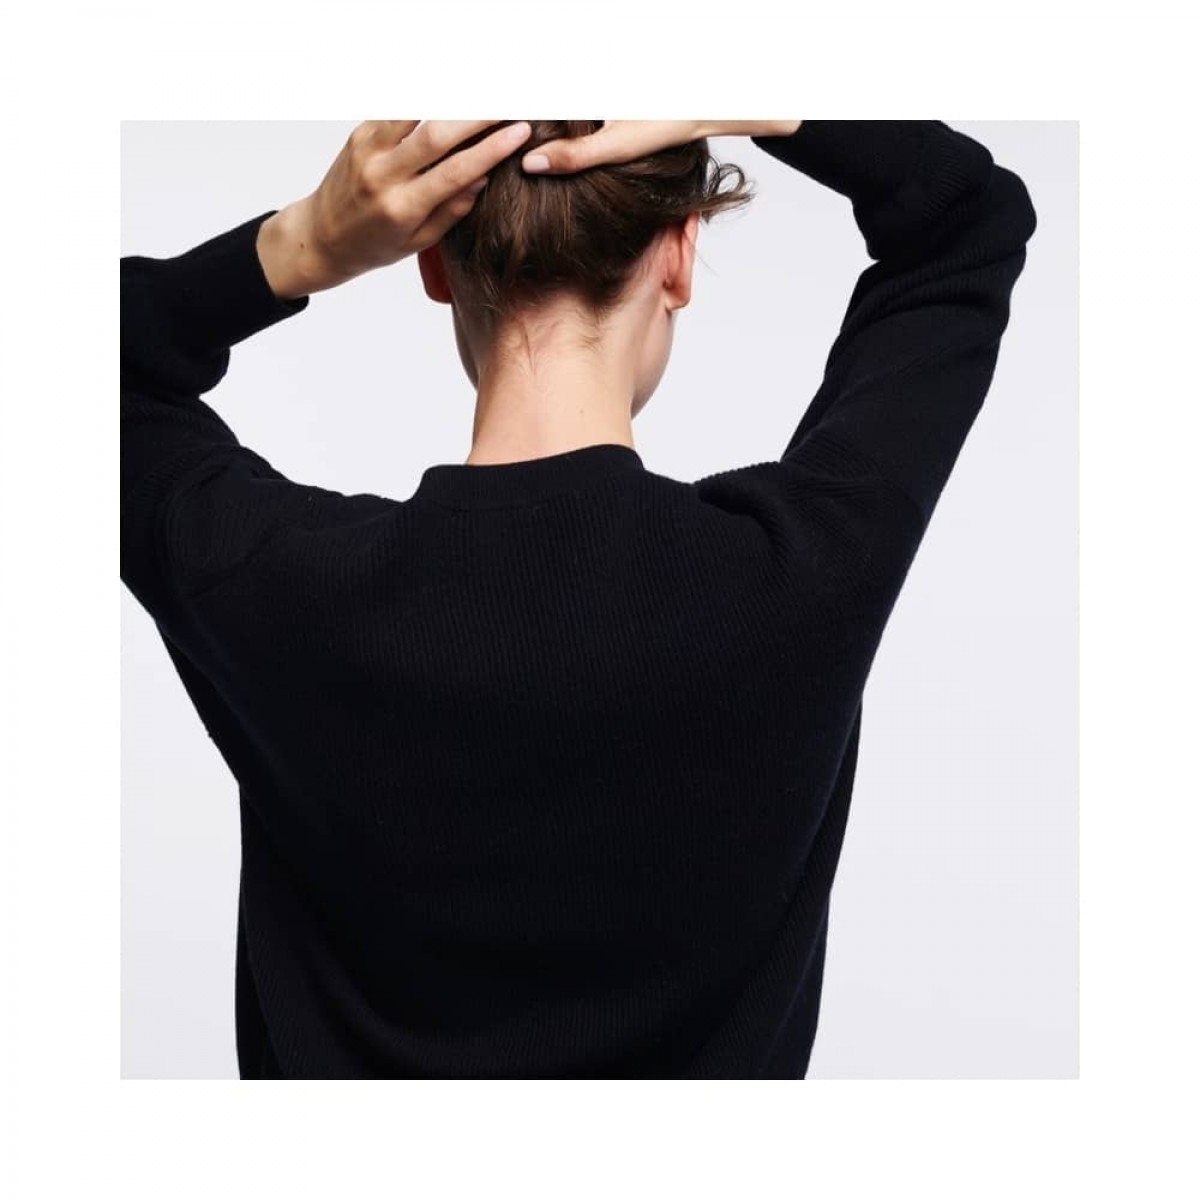 sam v-hals strik - black -model fra ryggen